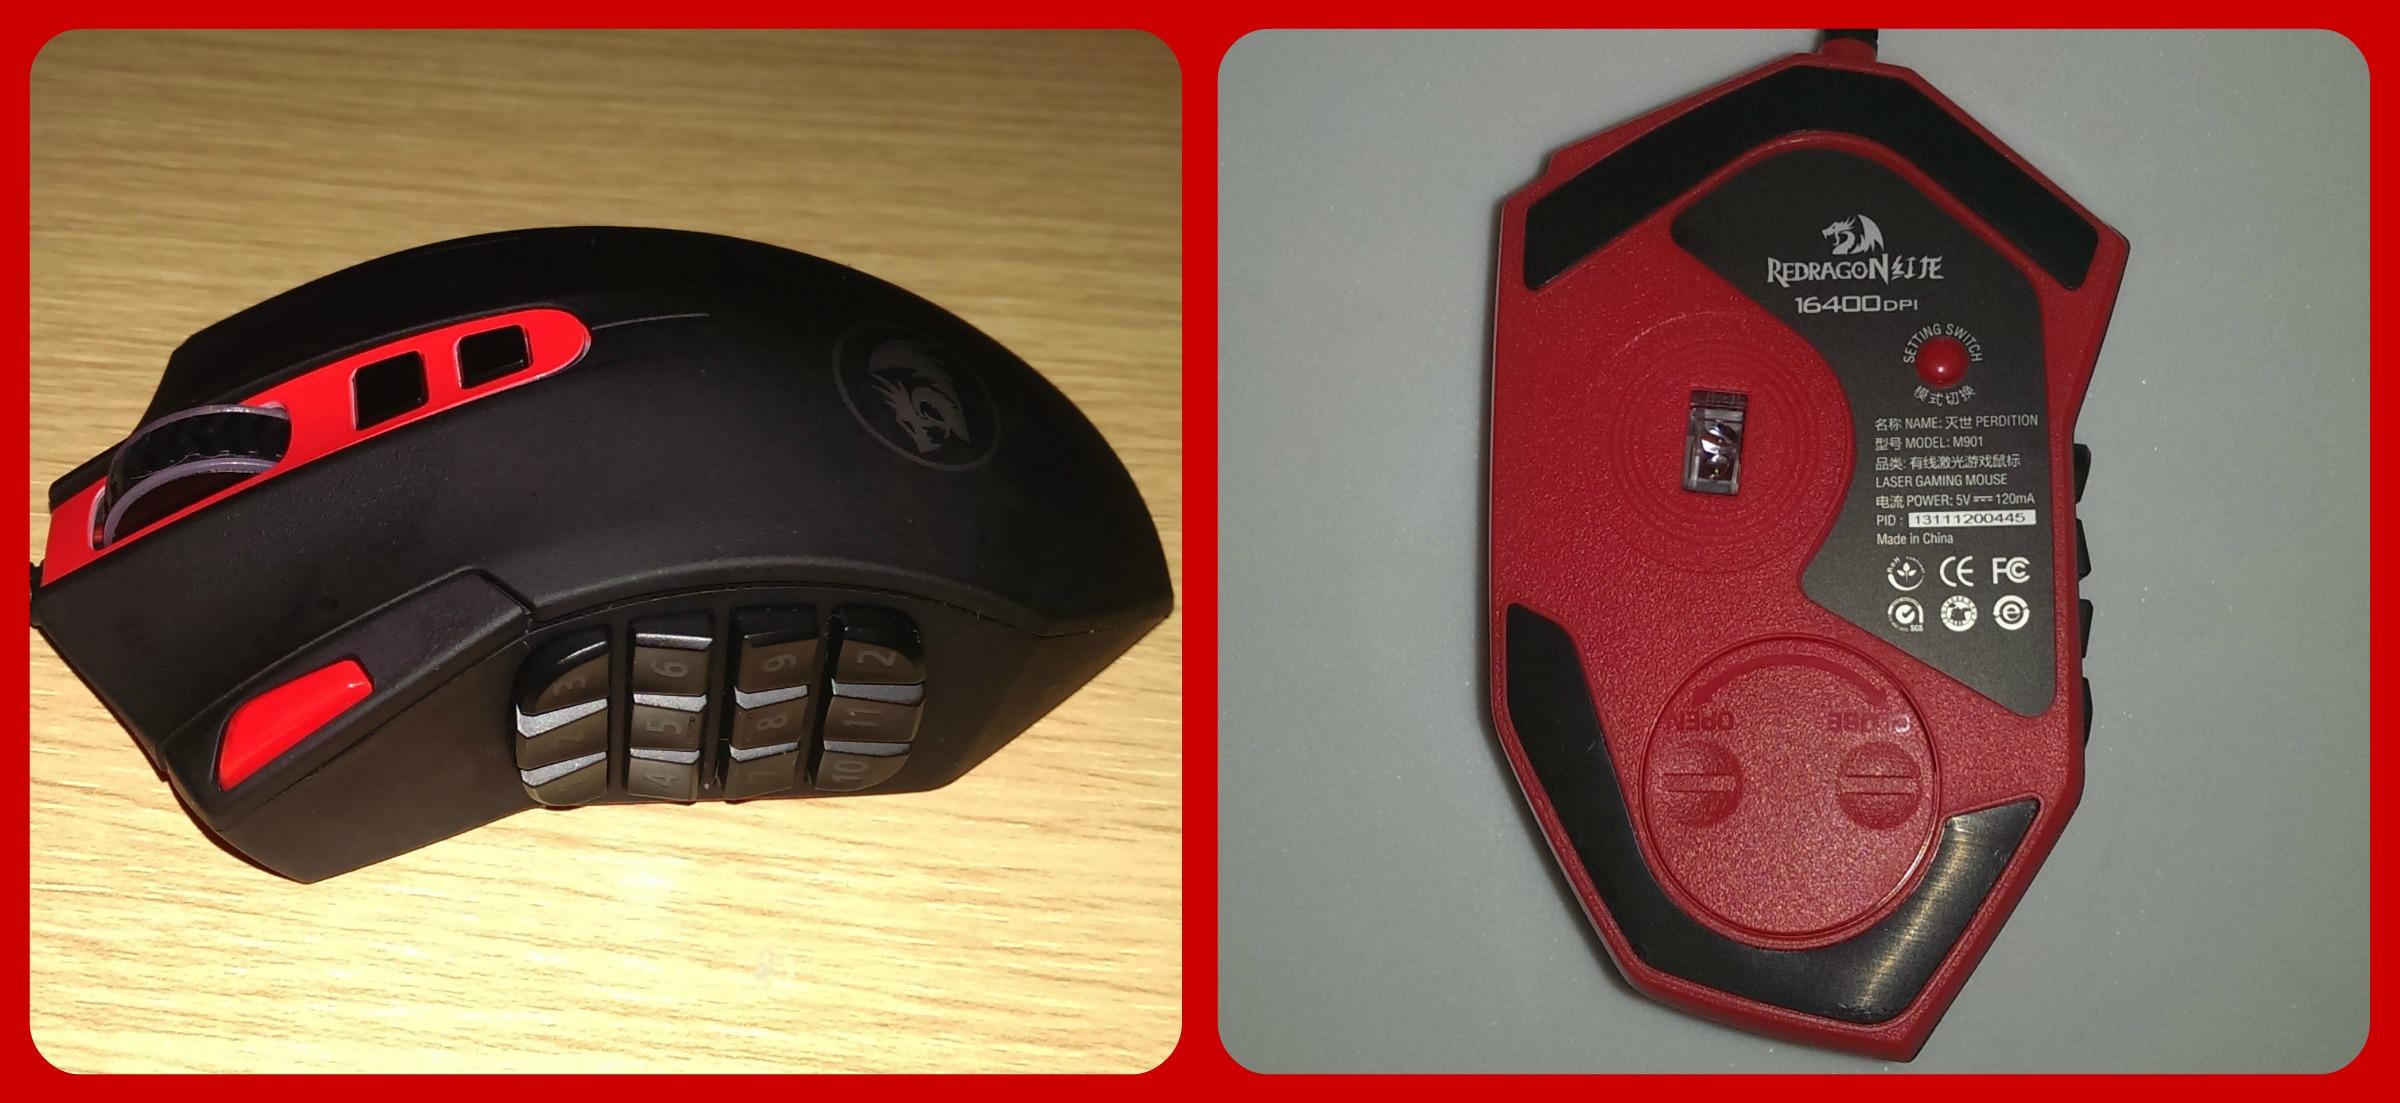 Tecknet Redragon Perdition 16400 Dpi Gaming Mouse Review Tootietazzy